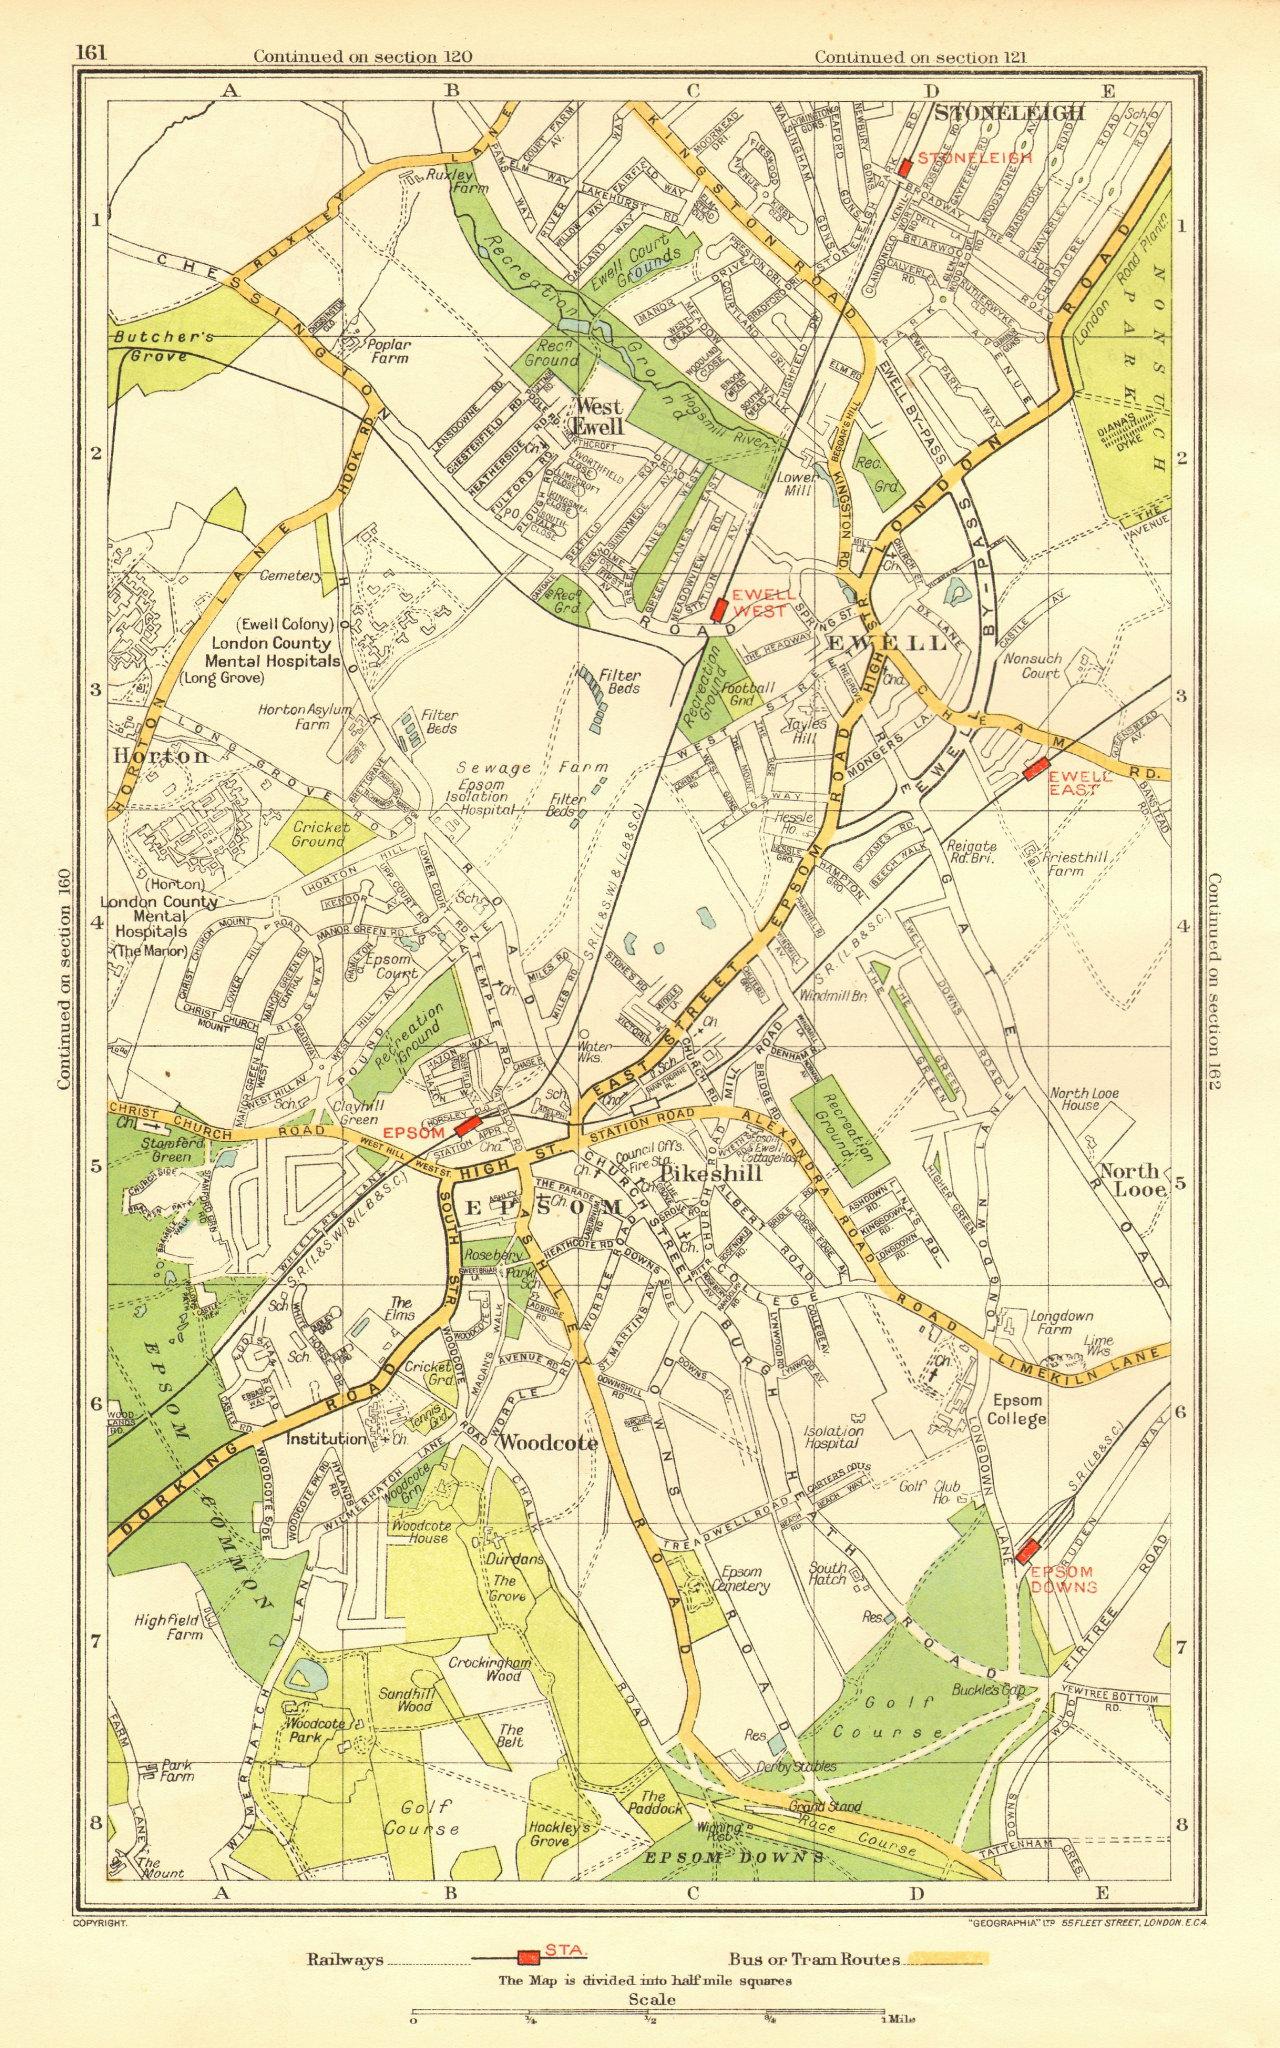 EPSOM EWELL. Stoneleigh North Looe Horton Pikeshill Woodcote (Surrey) 1937 map